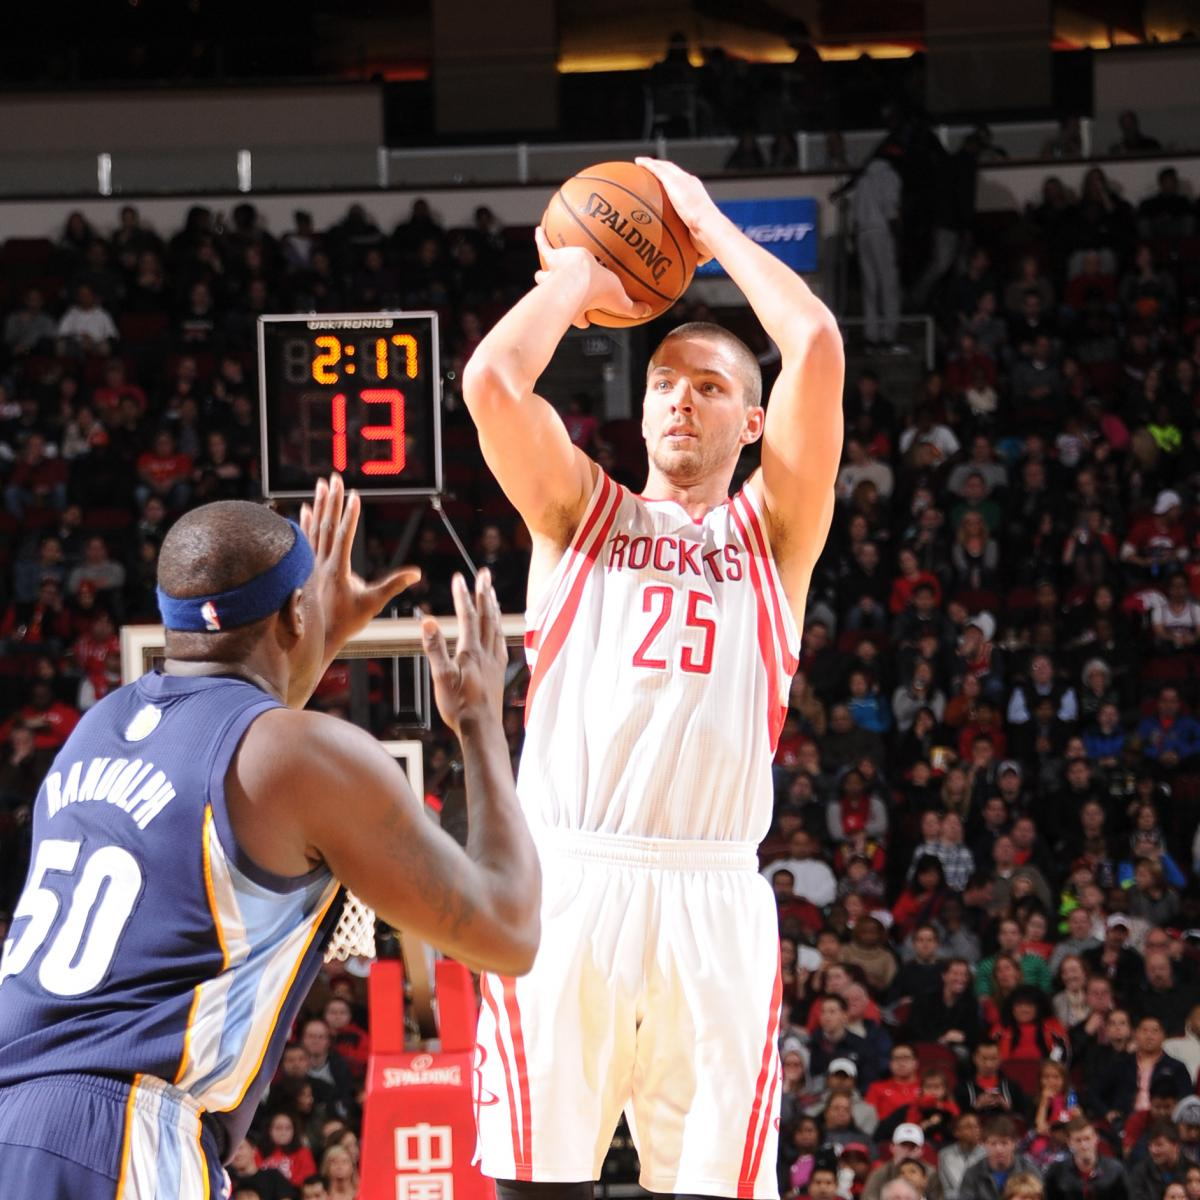 Houston Rockets 3rd Quarter Stats: Chandler Parsons Hits 10 Threes In 1 Half, Sets NBA Record